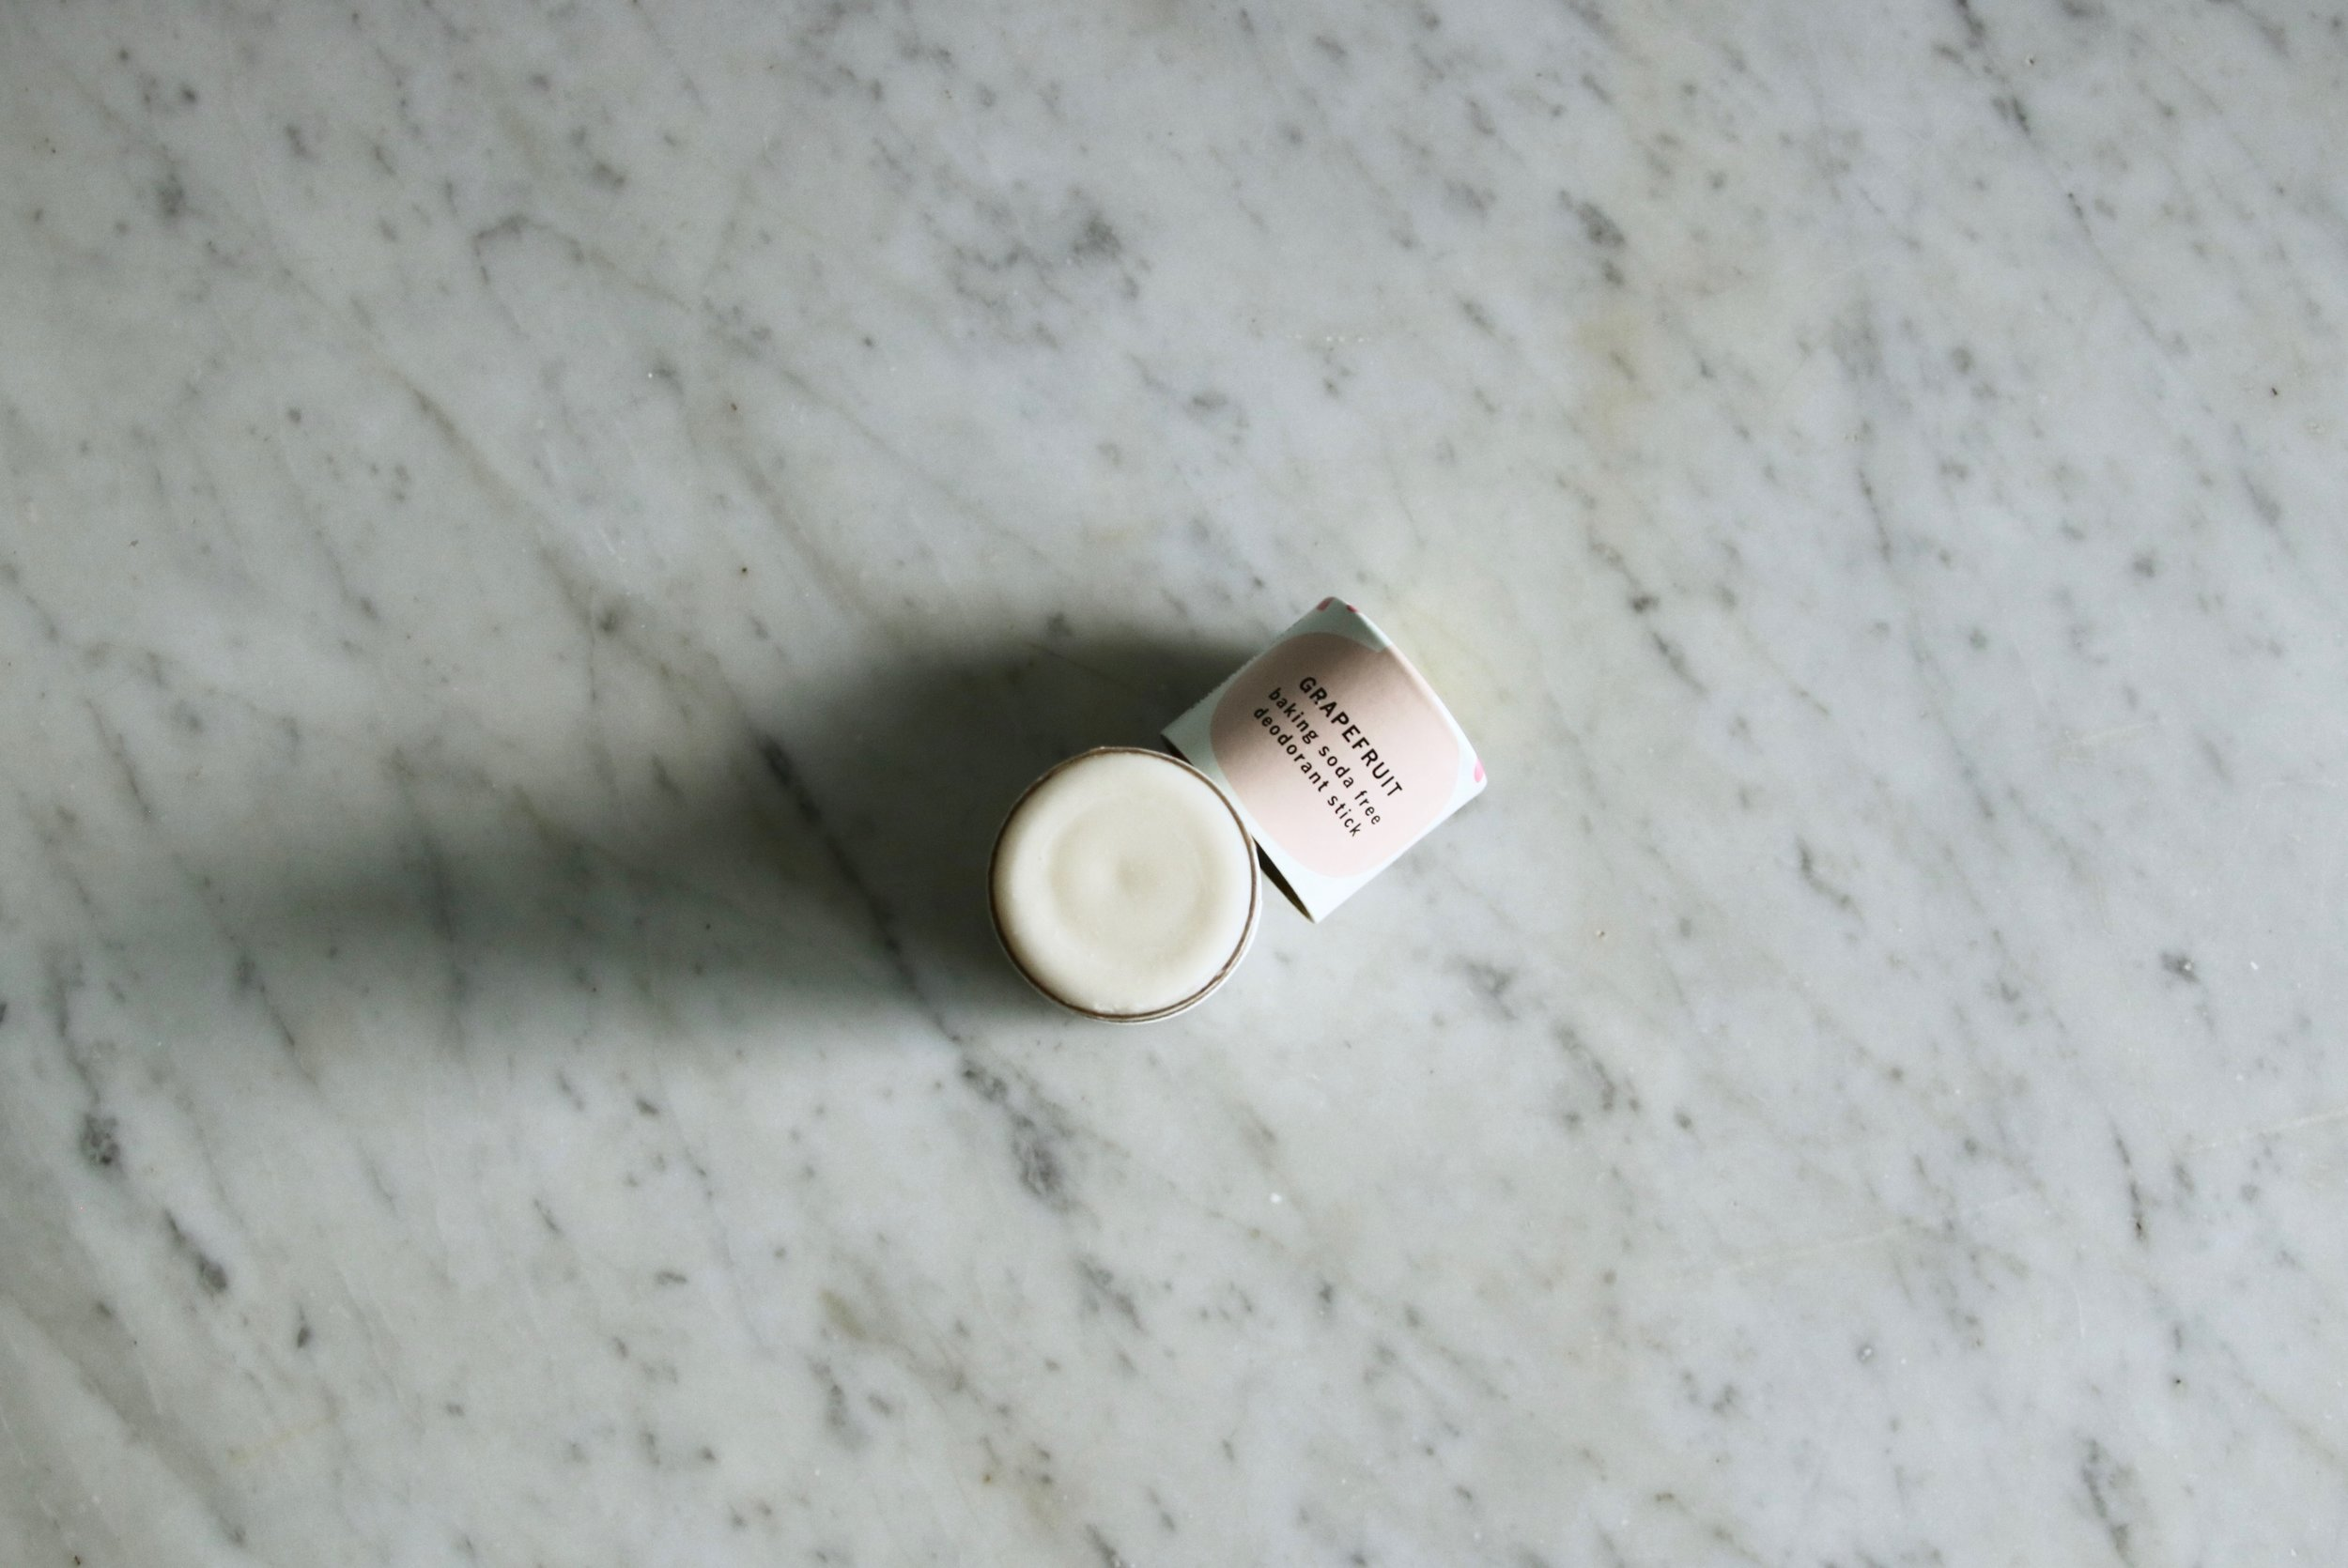 Zero waste deodorant for sensitive skin | Litterless